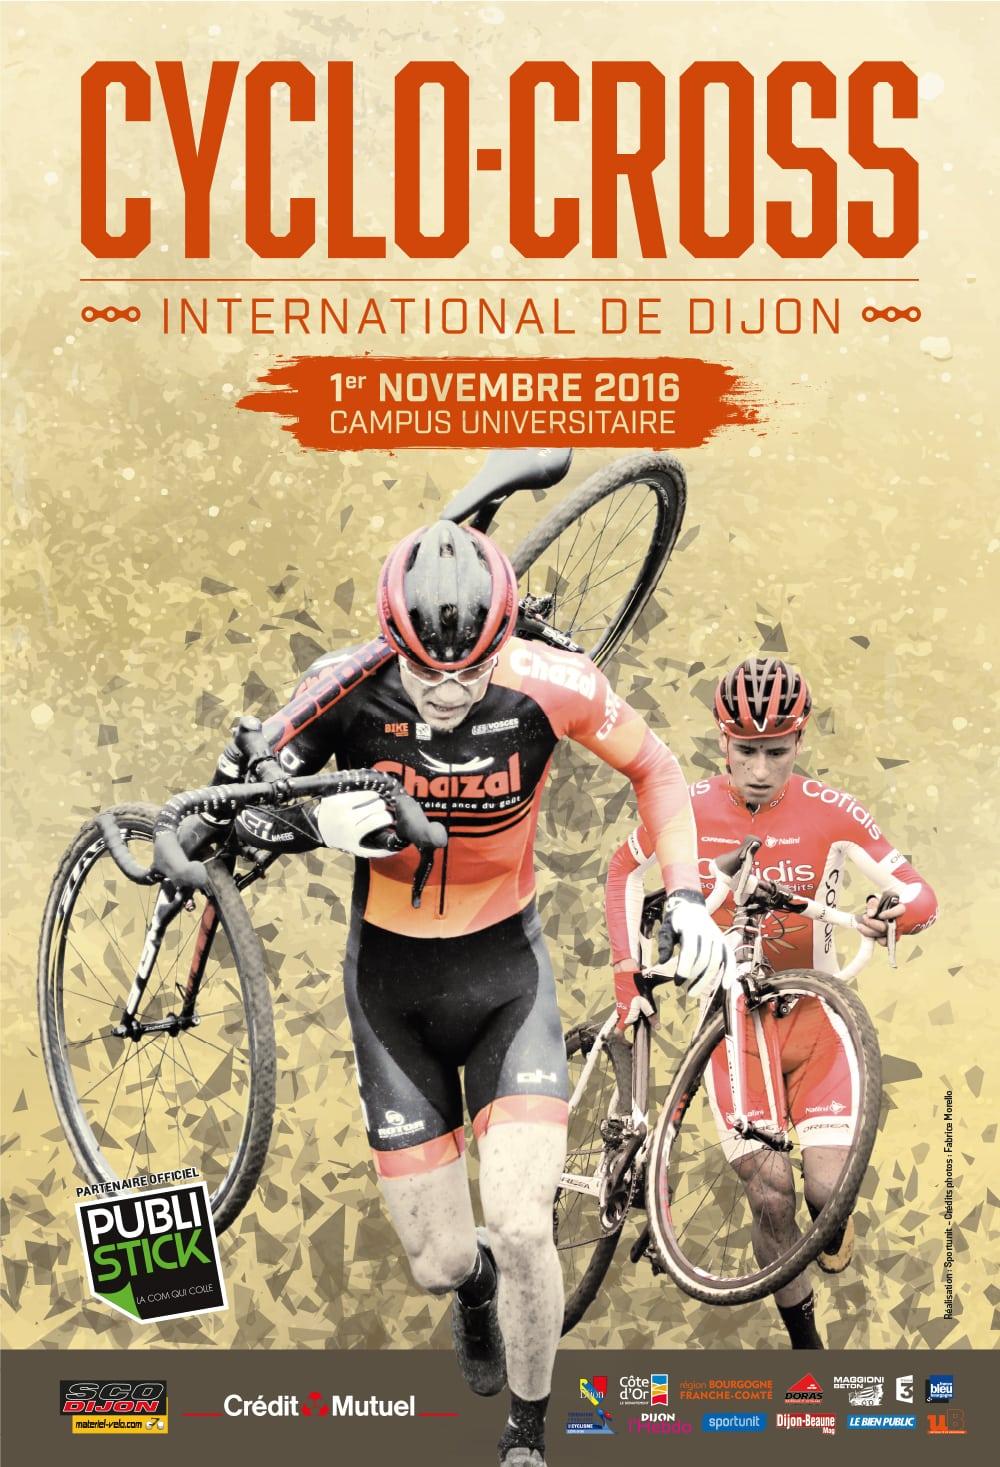 Cyclo-cross international de Dijon : tous au campus mardi !